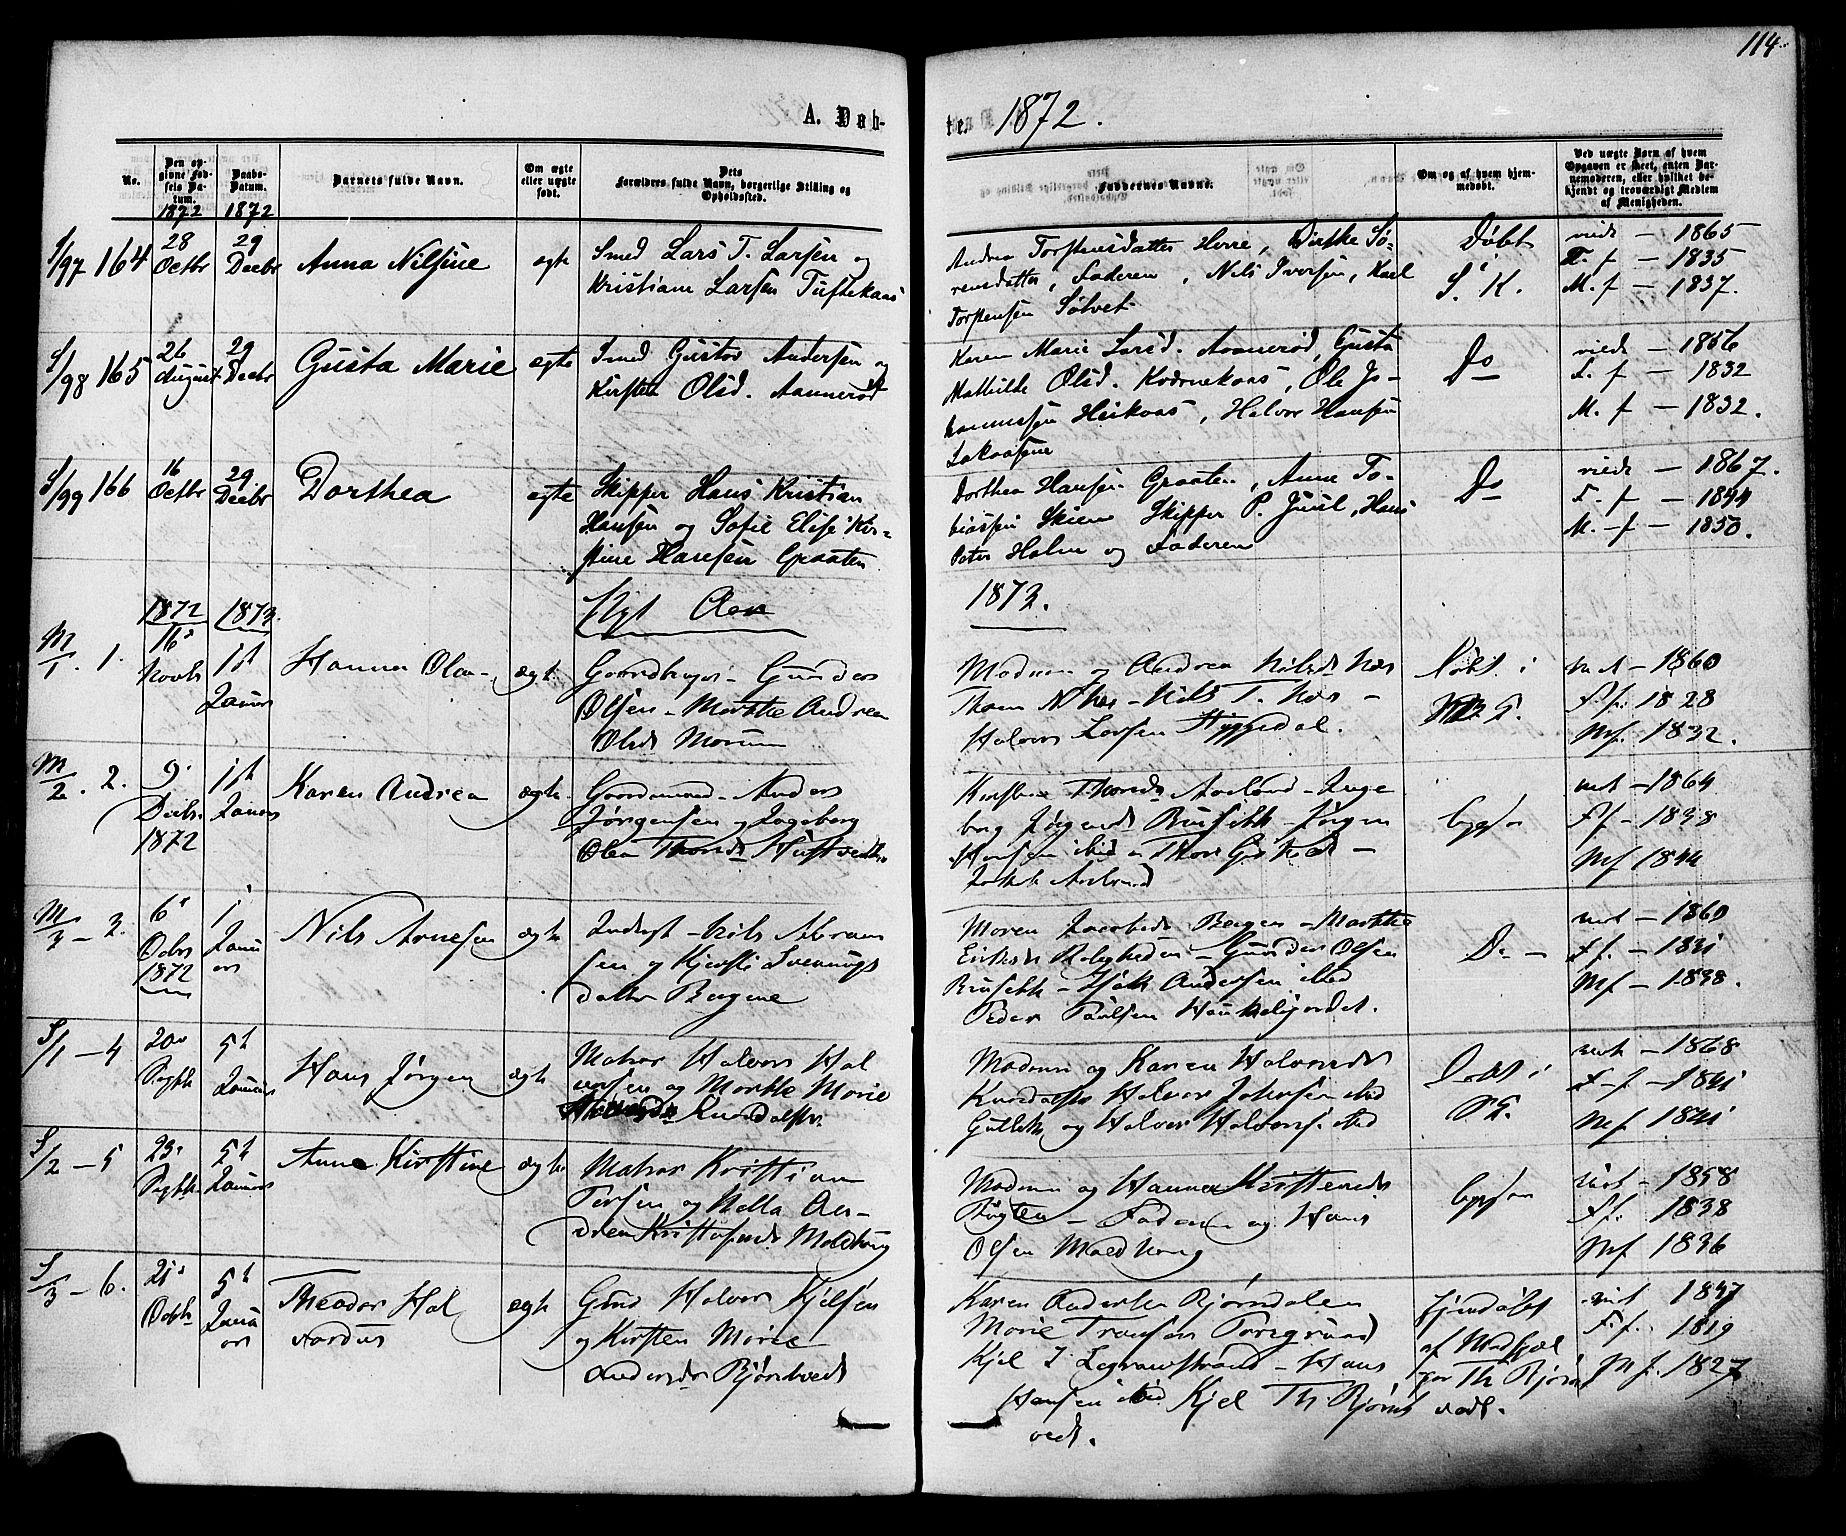 SAKO, Solum kirkebøker, F/Fa/L0008: Ministerialbok nr. I 8, 1865-1876, s. 114